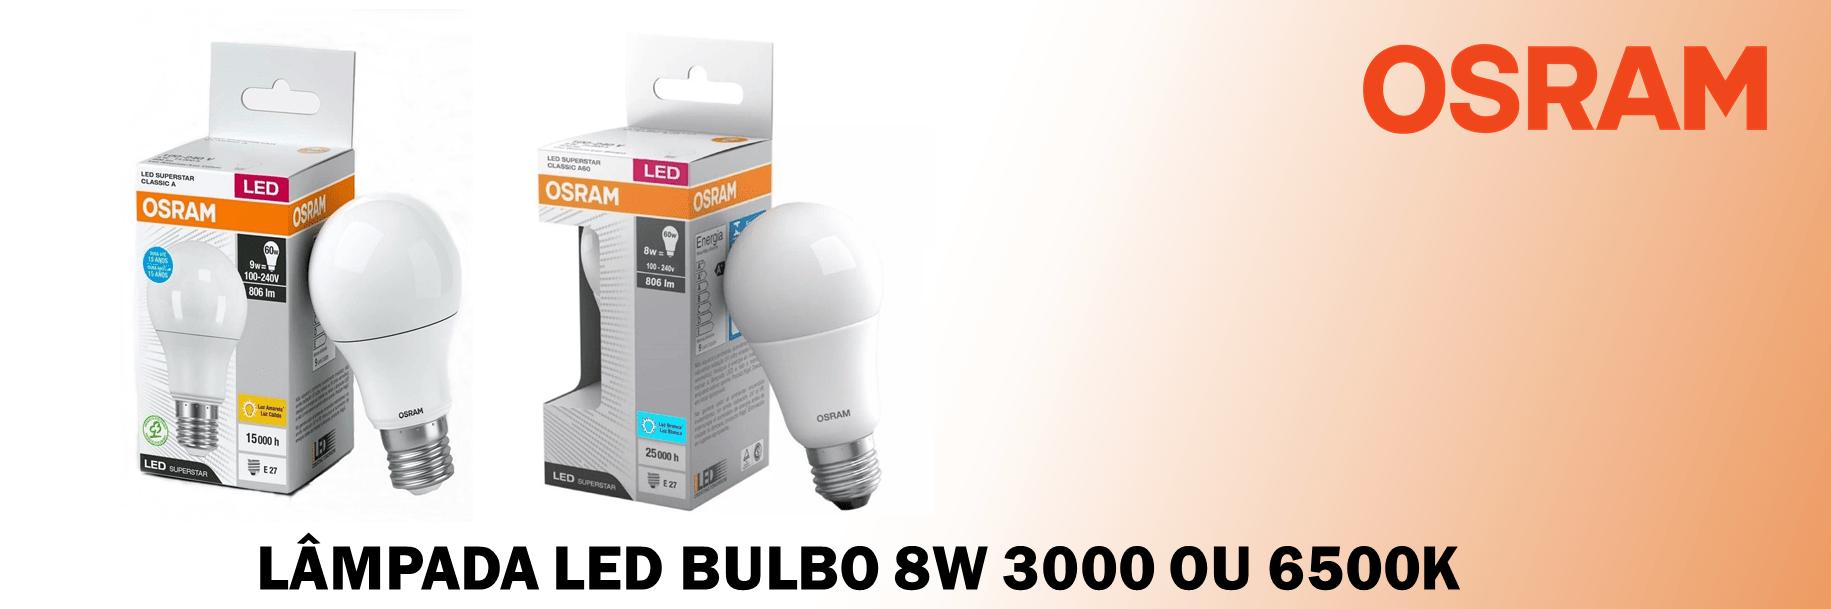 Lâmpada LED Bulbo 3000 ou 6500k OSRAM